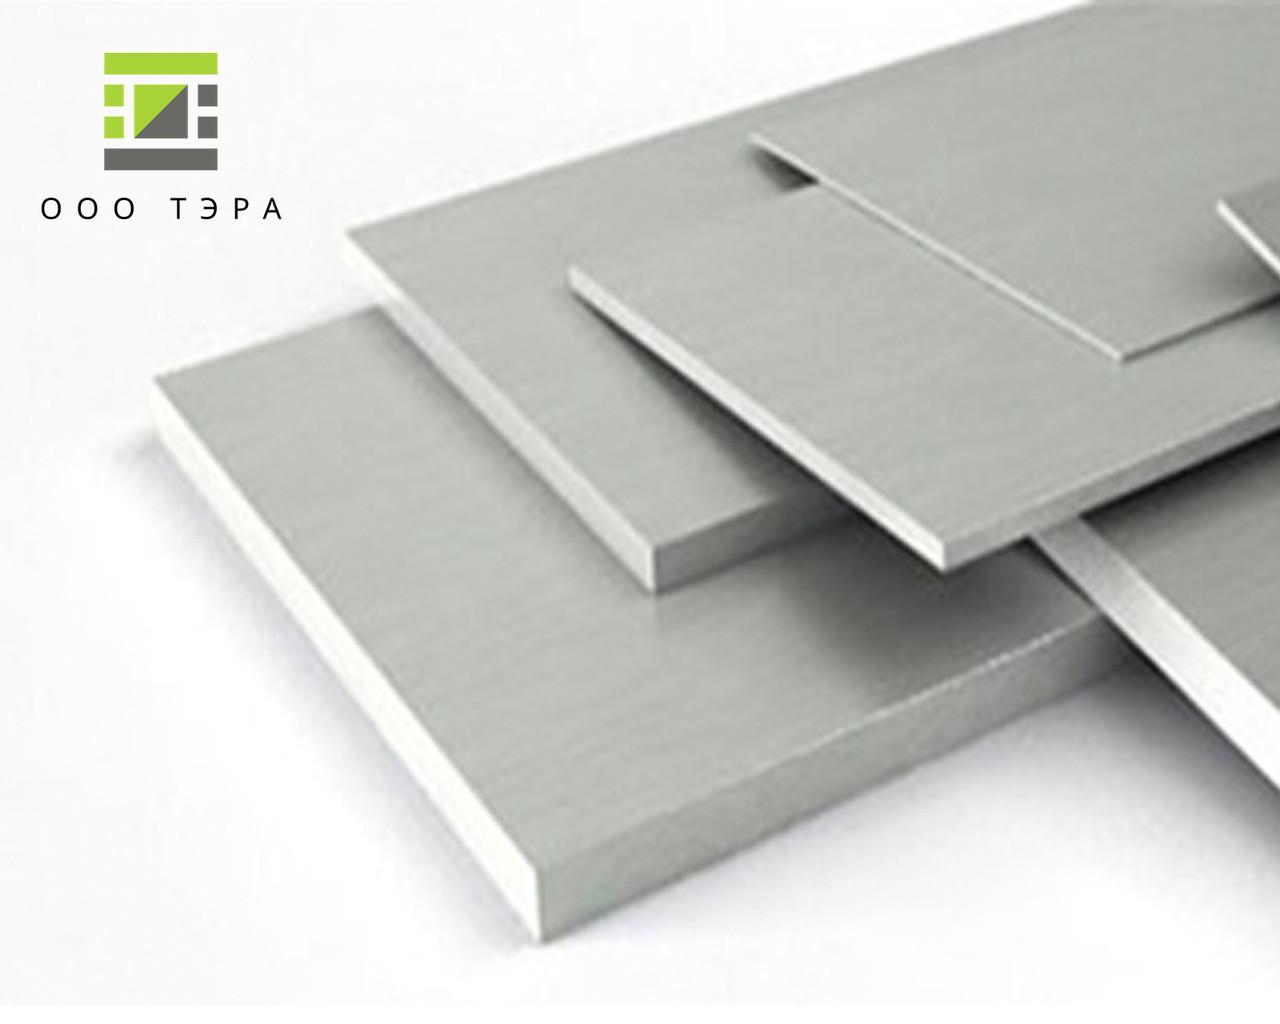 Шина алюминиевая полосам 80 мм 6082 (АД35Т) 80х5; 80х15; 80х20; 80х30; 80х40 мм